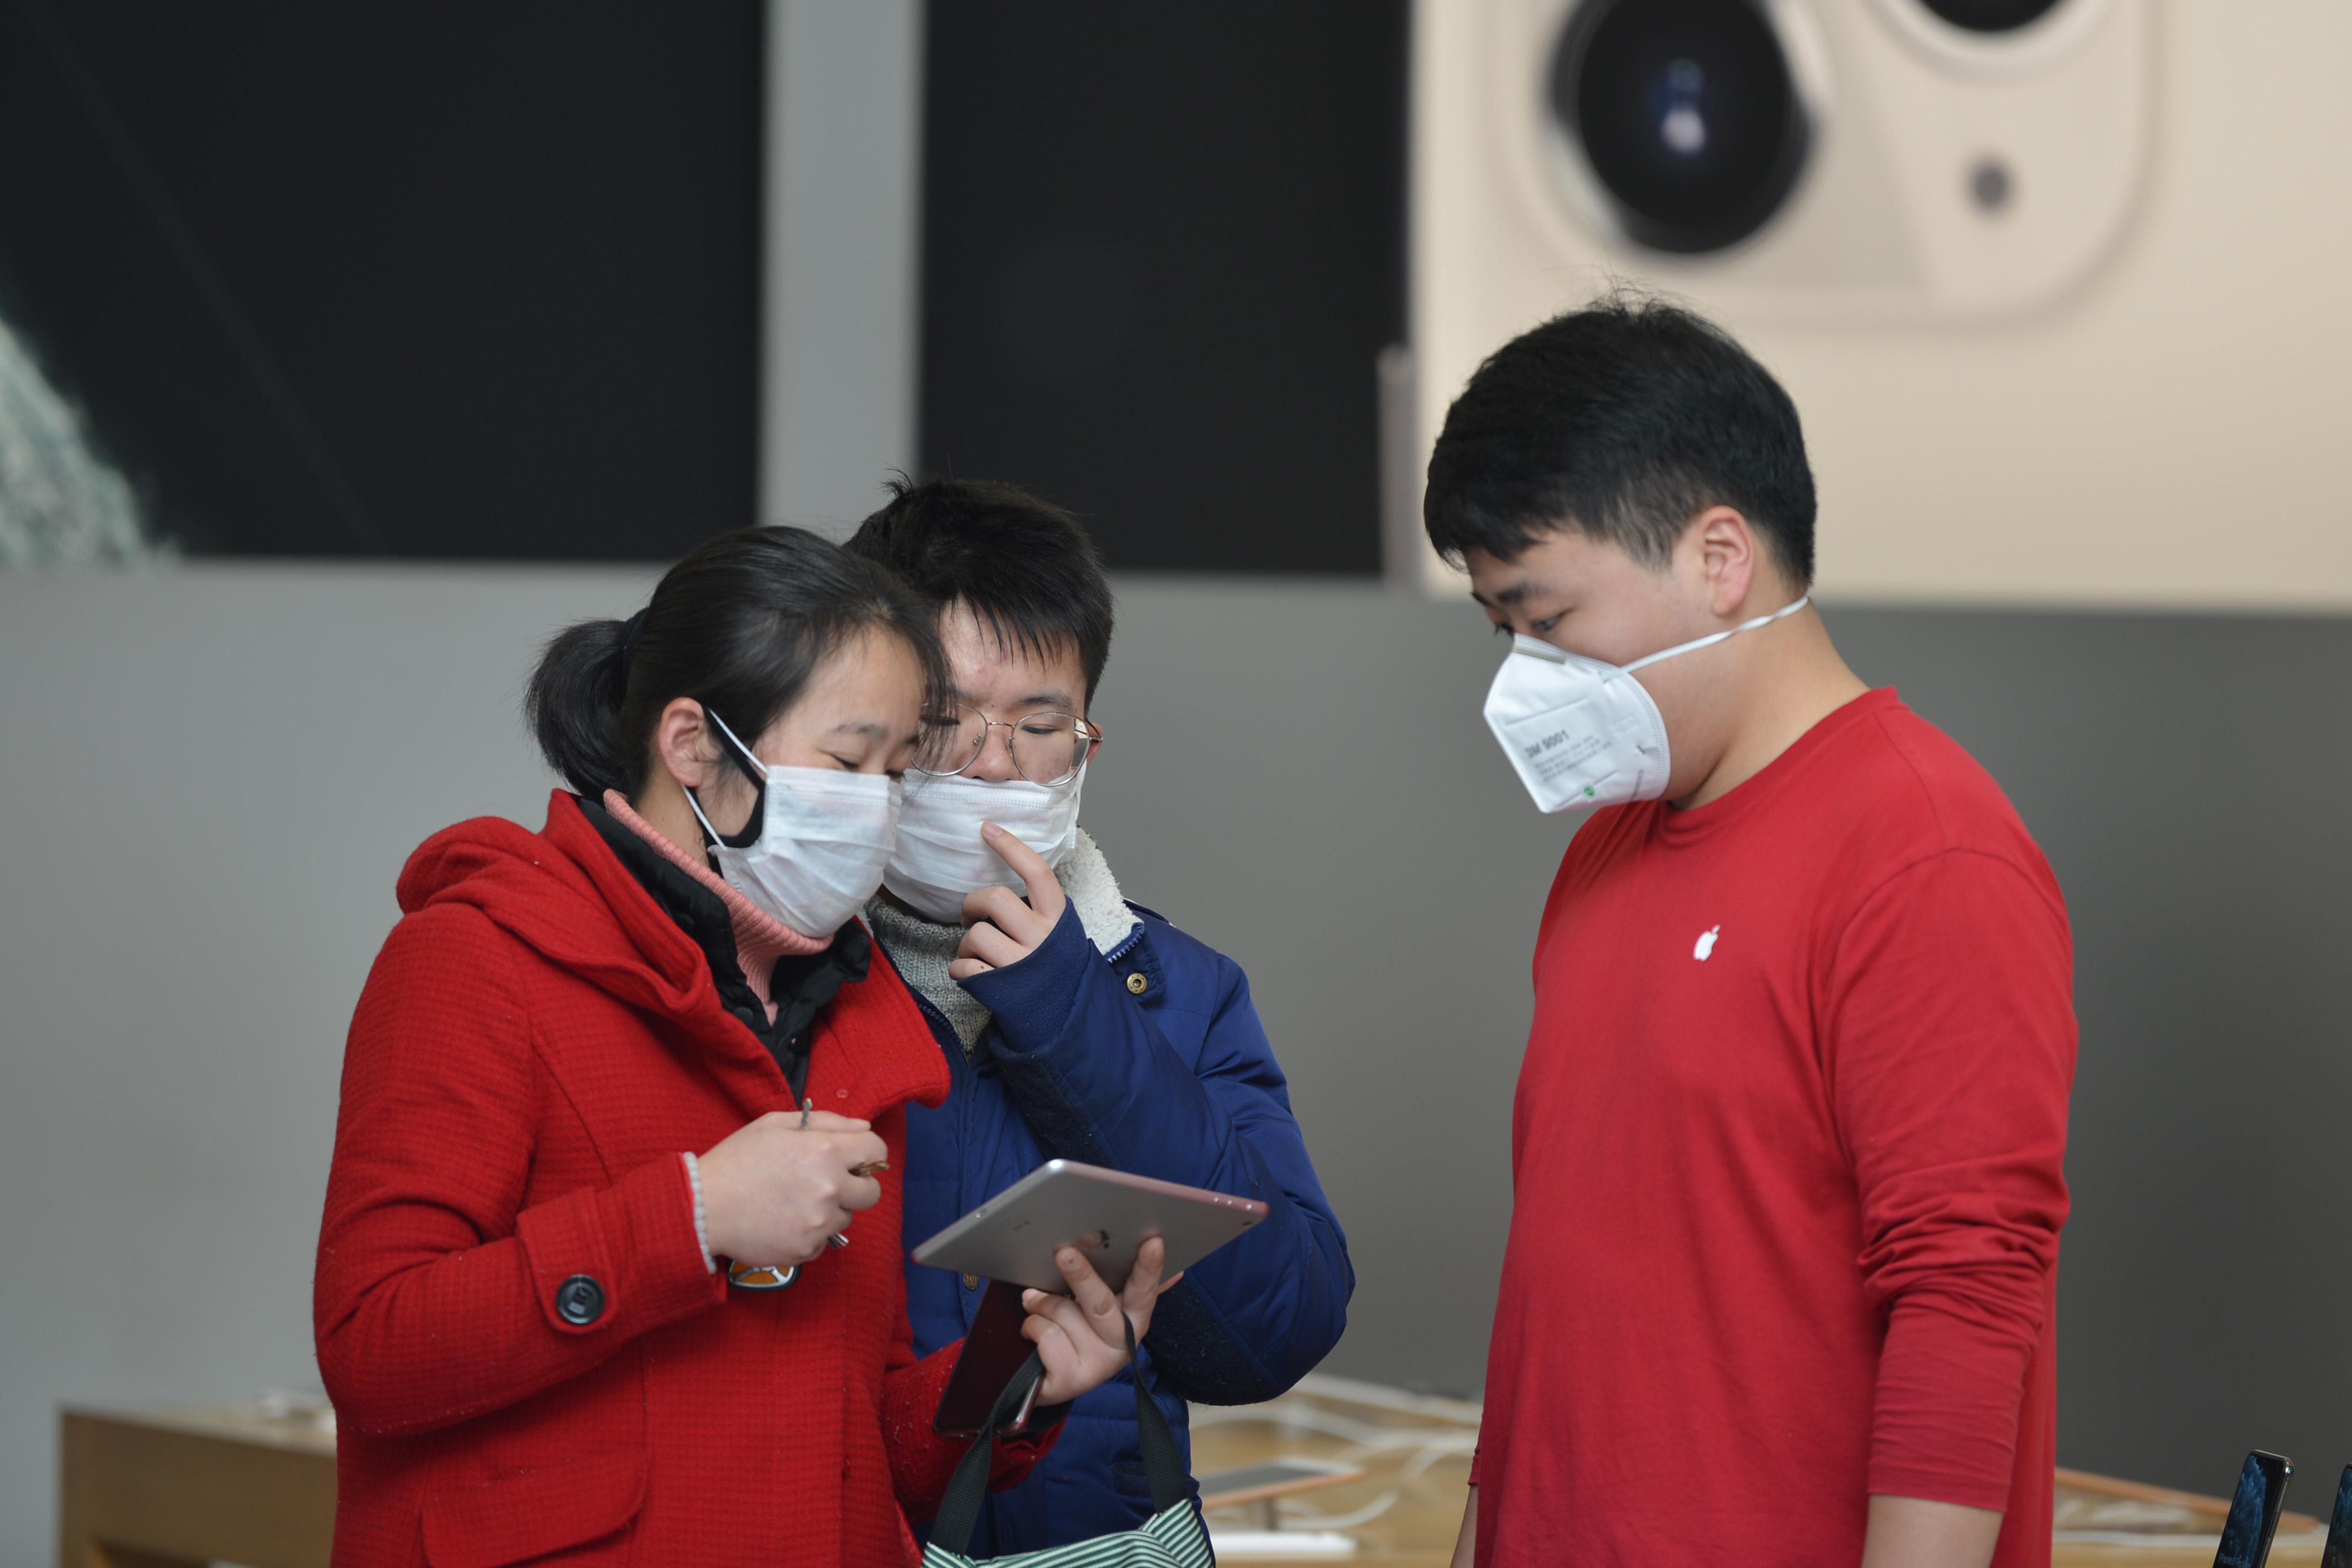 CHINA NANJING APPLE STORE SHUTDOWN